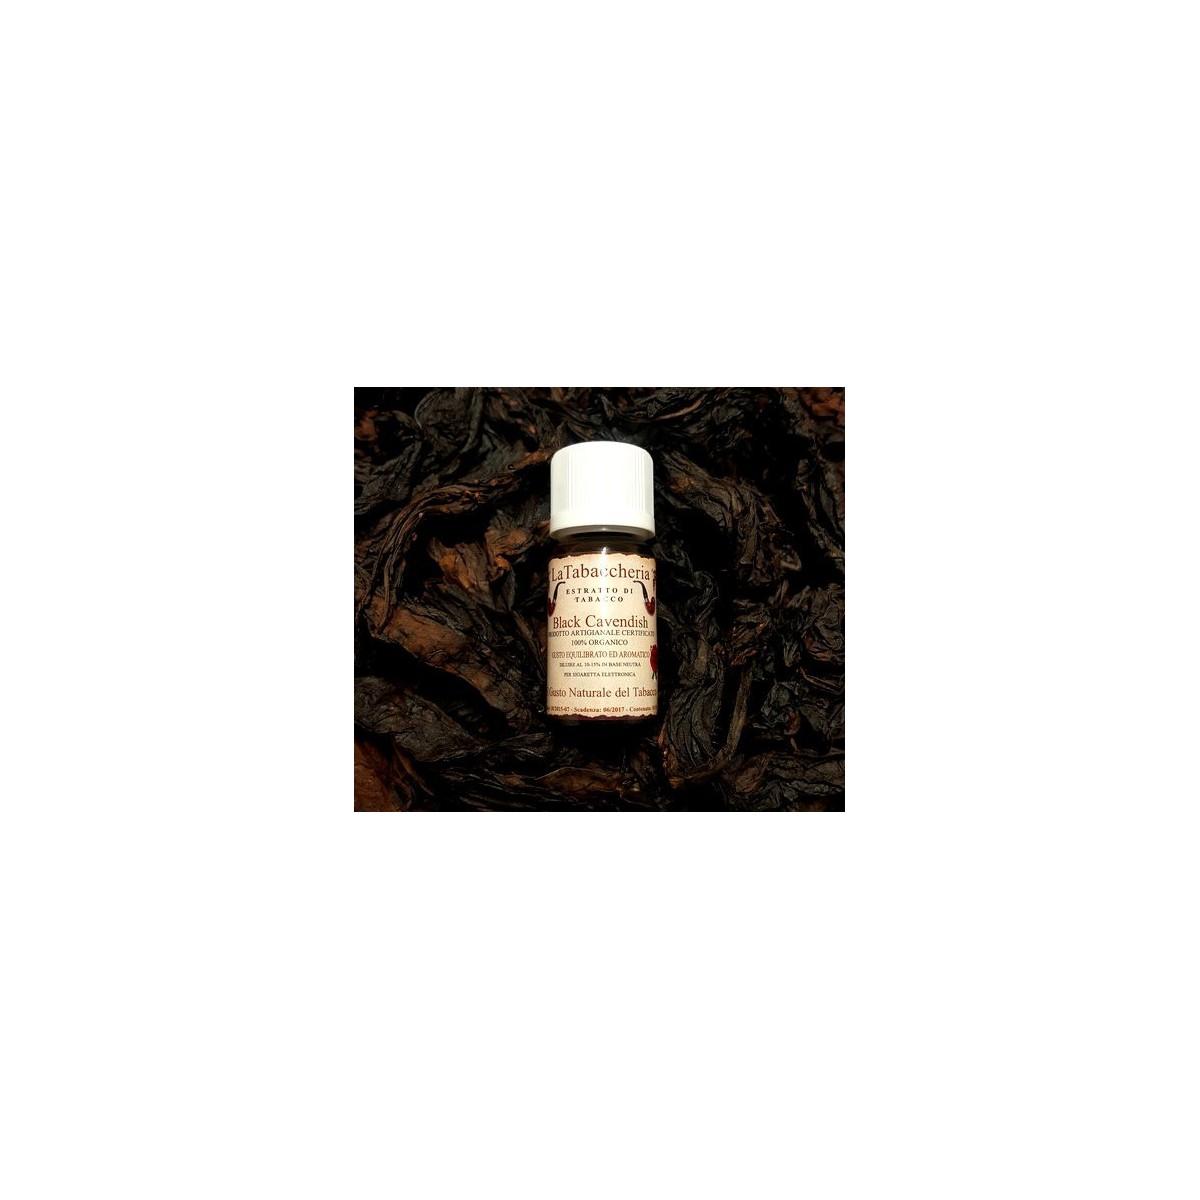 Black Cavendish - La Tabaccheria